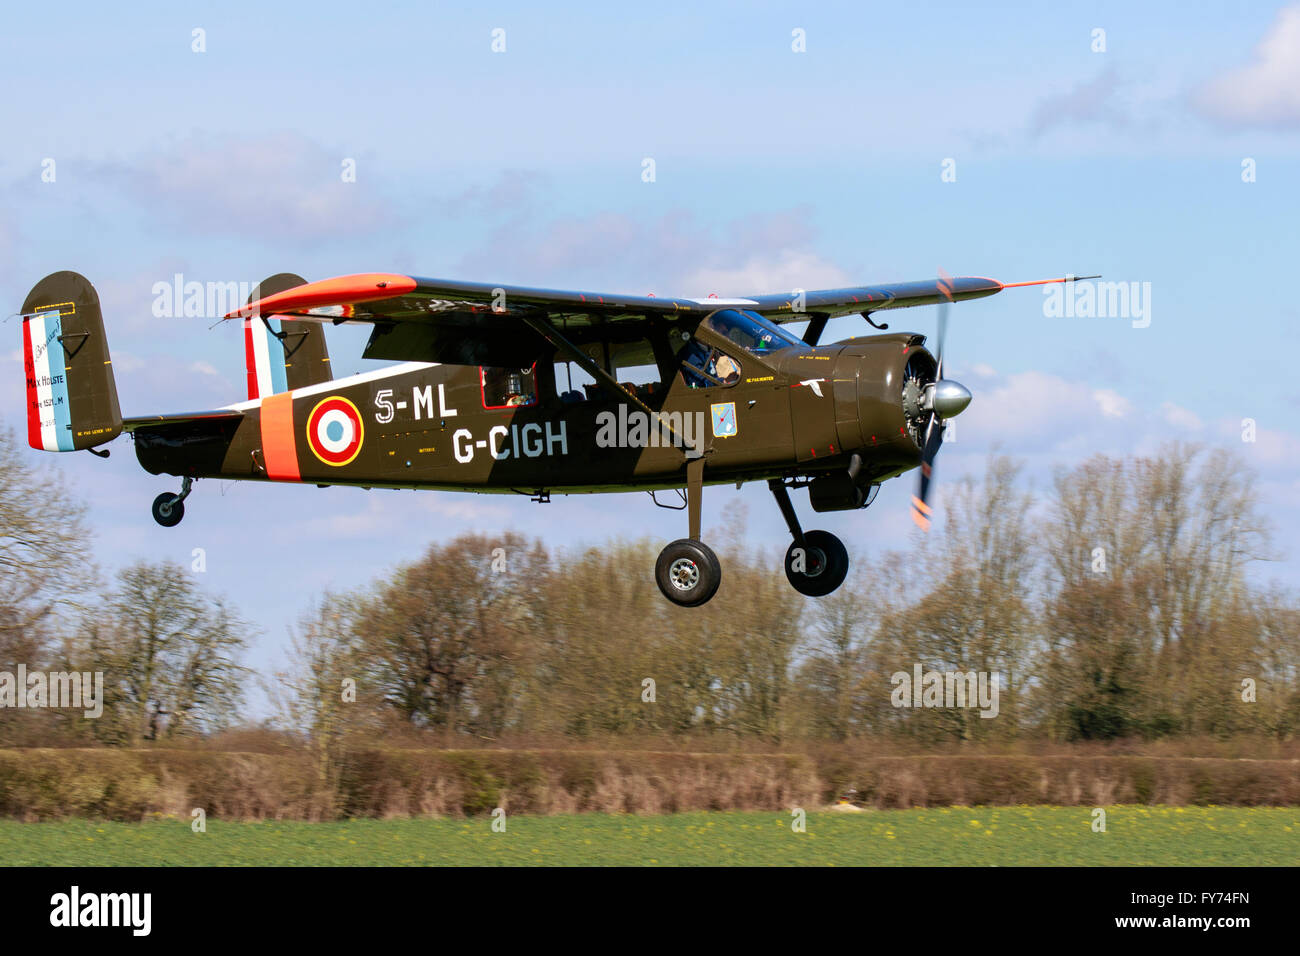 la meilleure attitude 7c4ea 858f4 Avions Max Holste MH 151 M 5-ML G-CIGH Broussard landing at ...